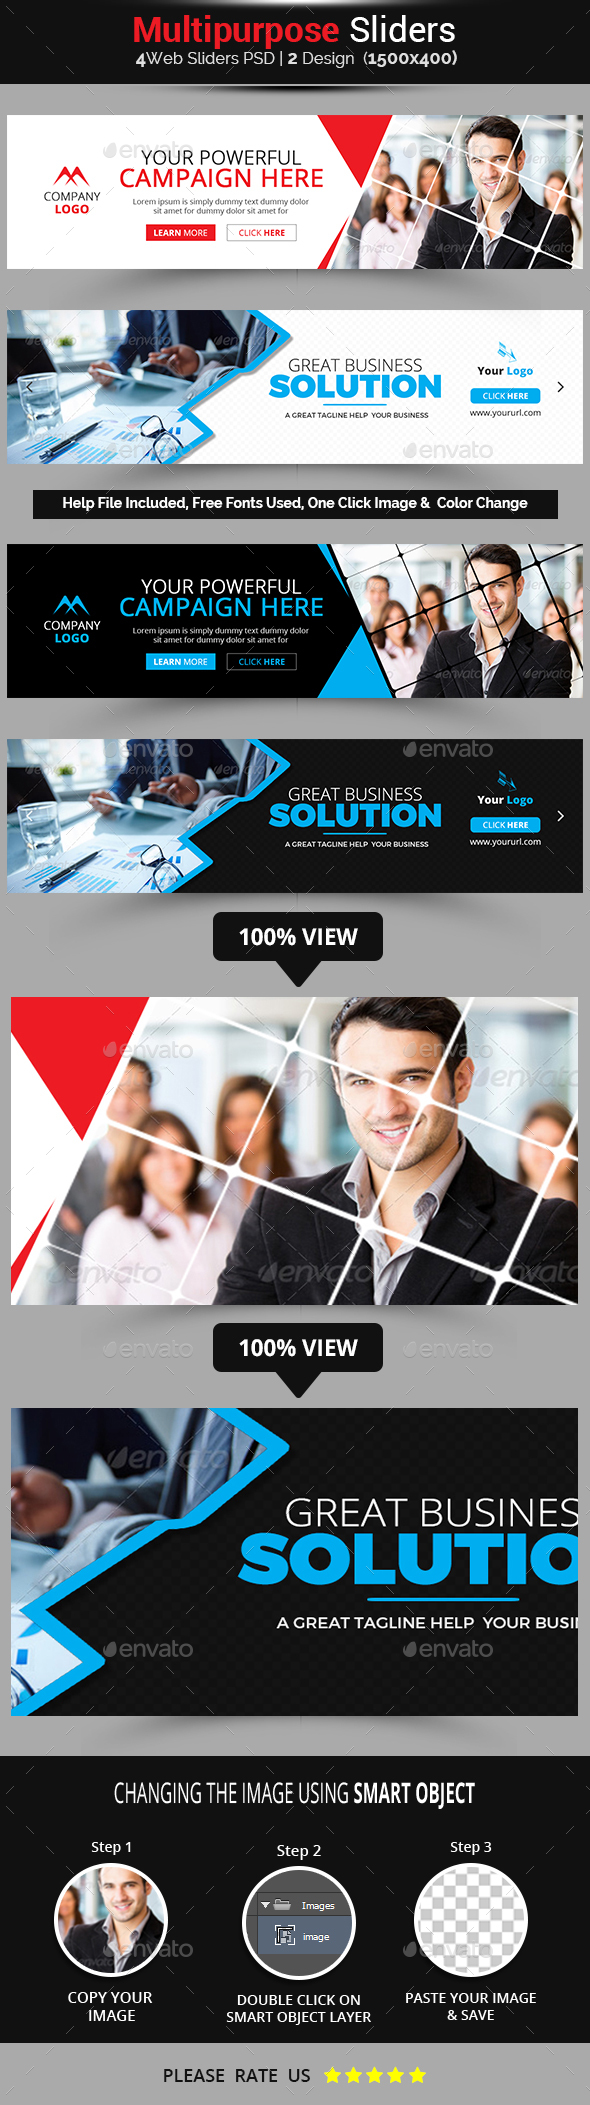 Multipurpose Business Sliders - Sliders & Features Web Elements